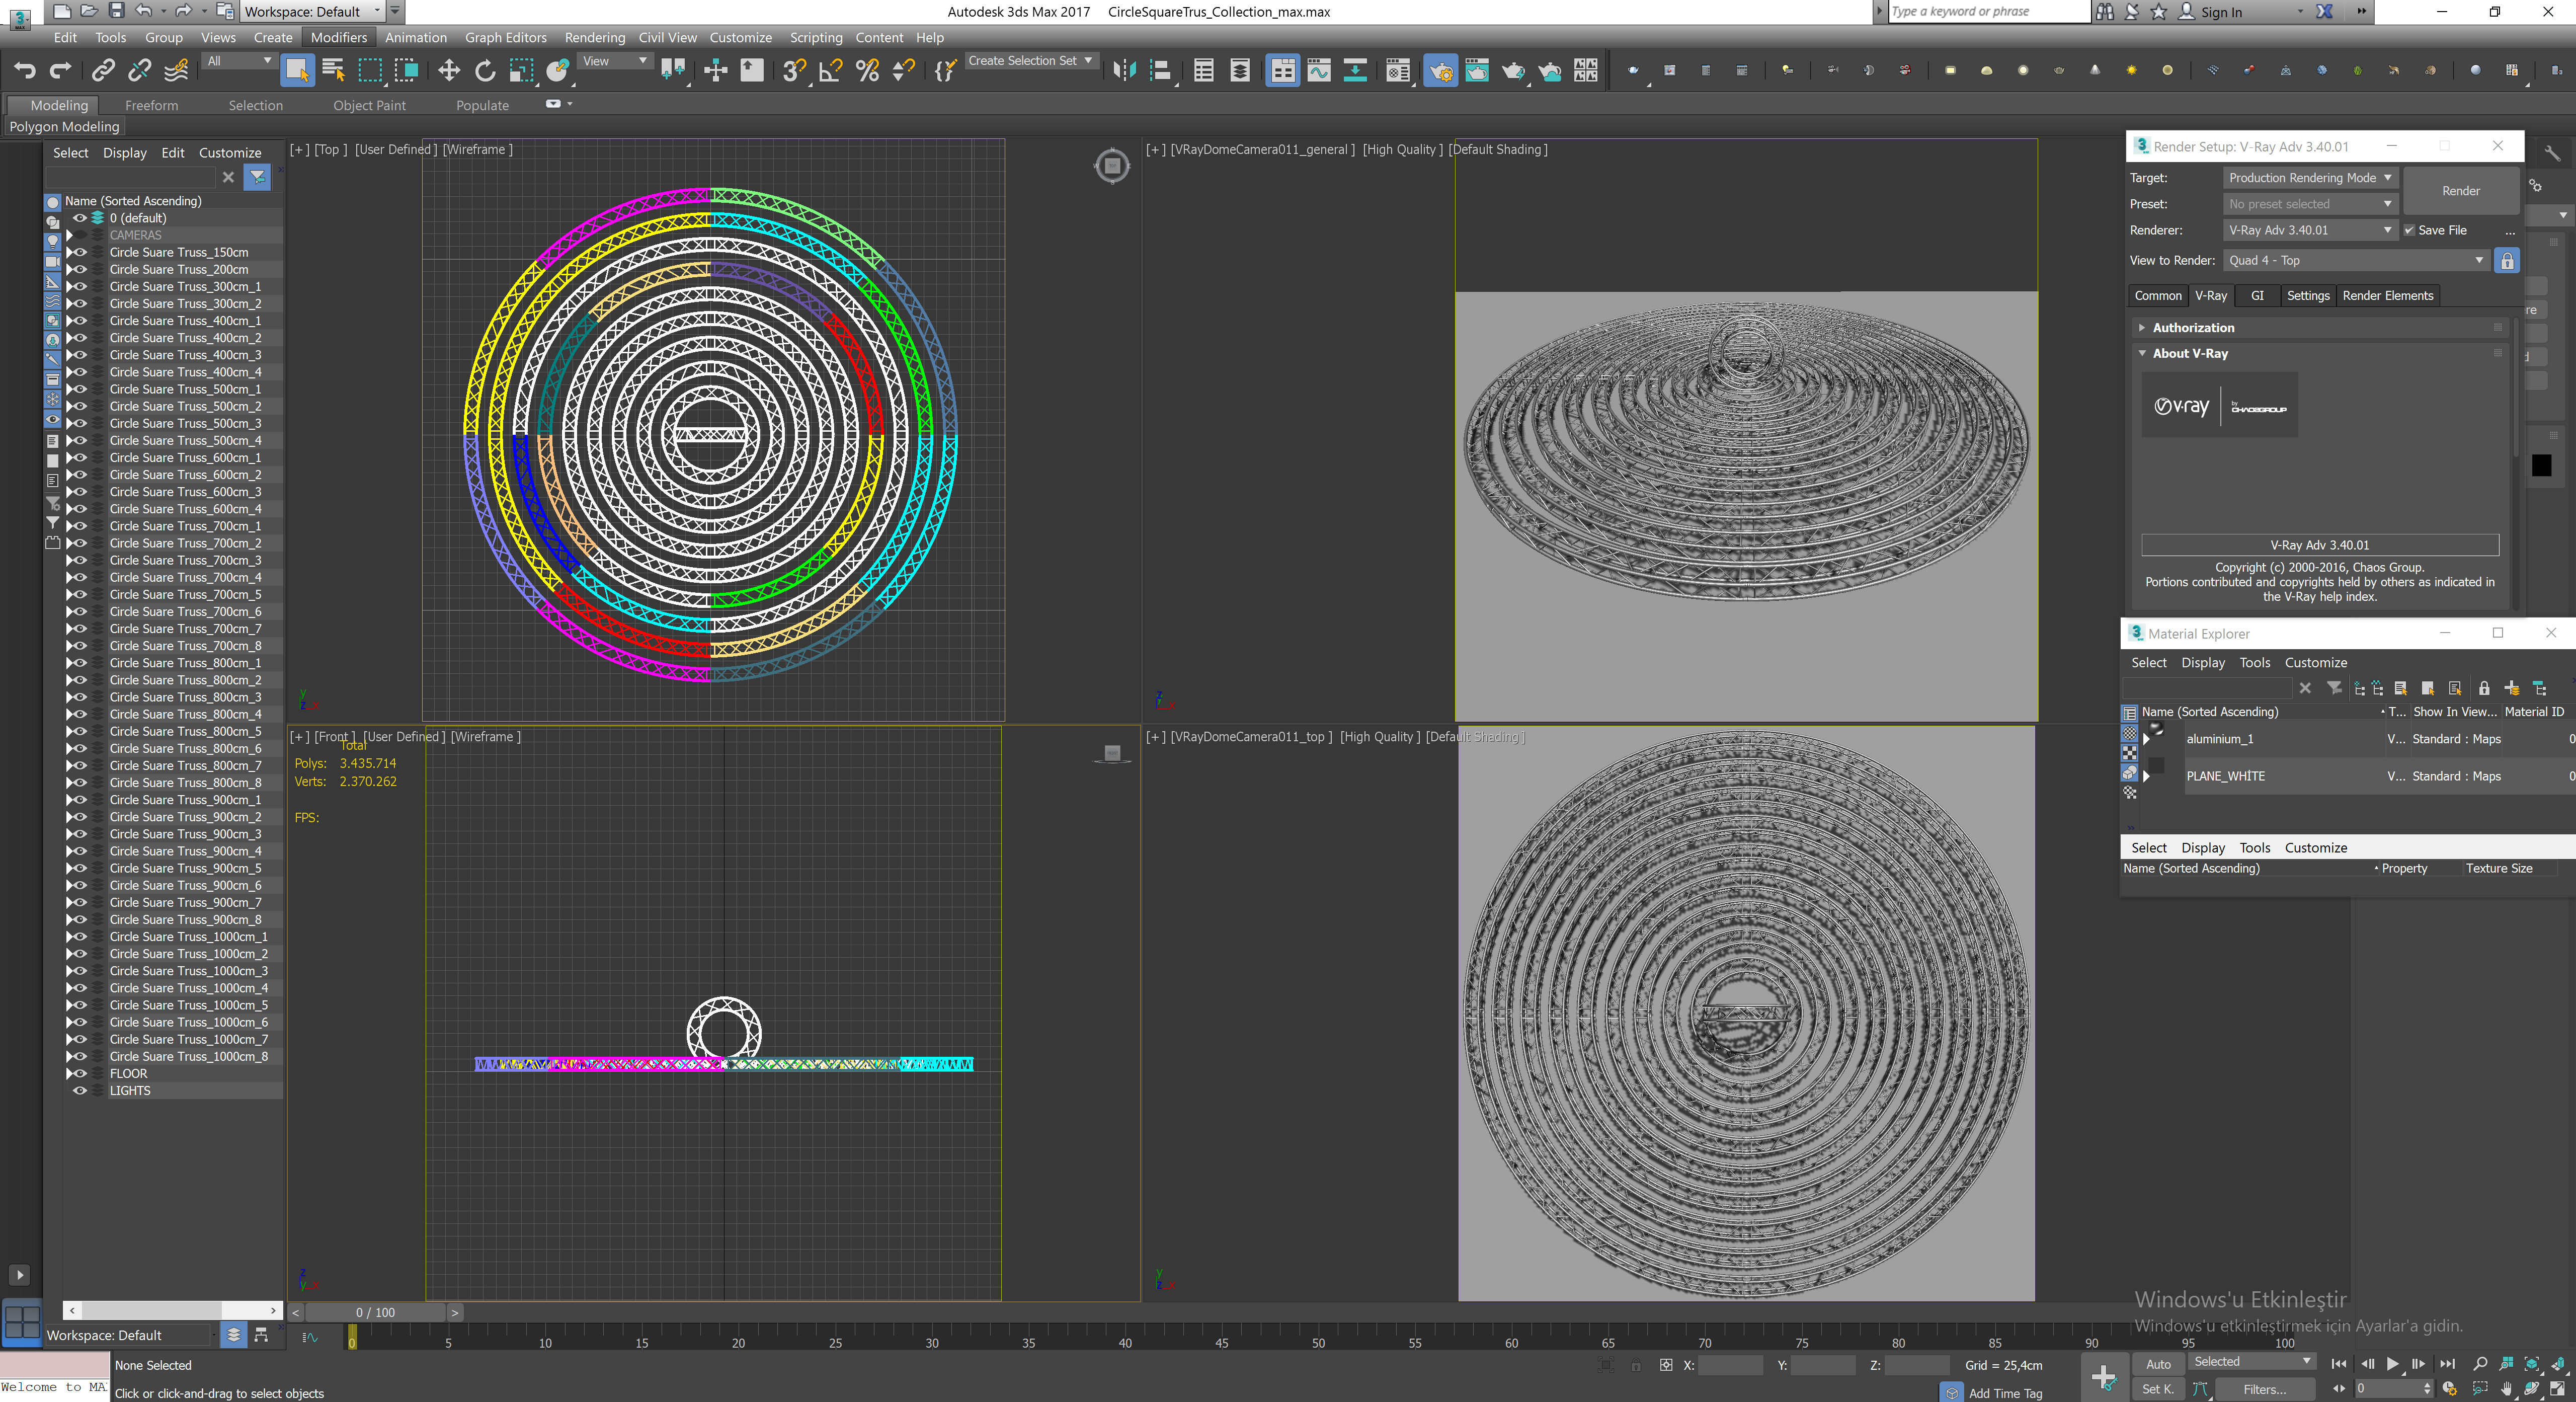 Circle Square Truss Modular Collection 10 Modular Pieces Truss Square Circle Modular Infographic Design Inspiration Square Infographic Design